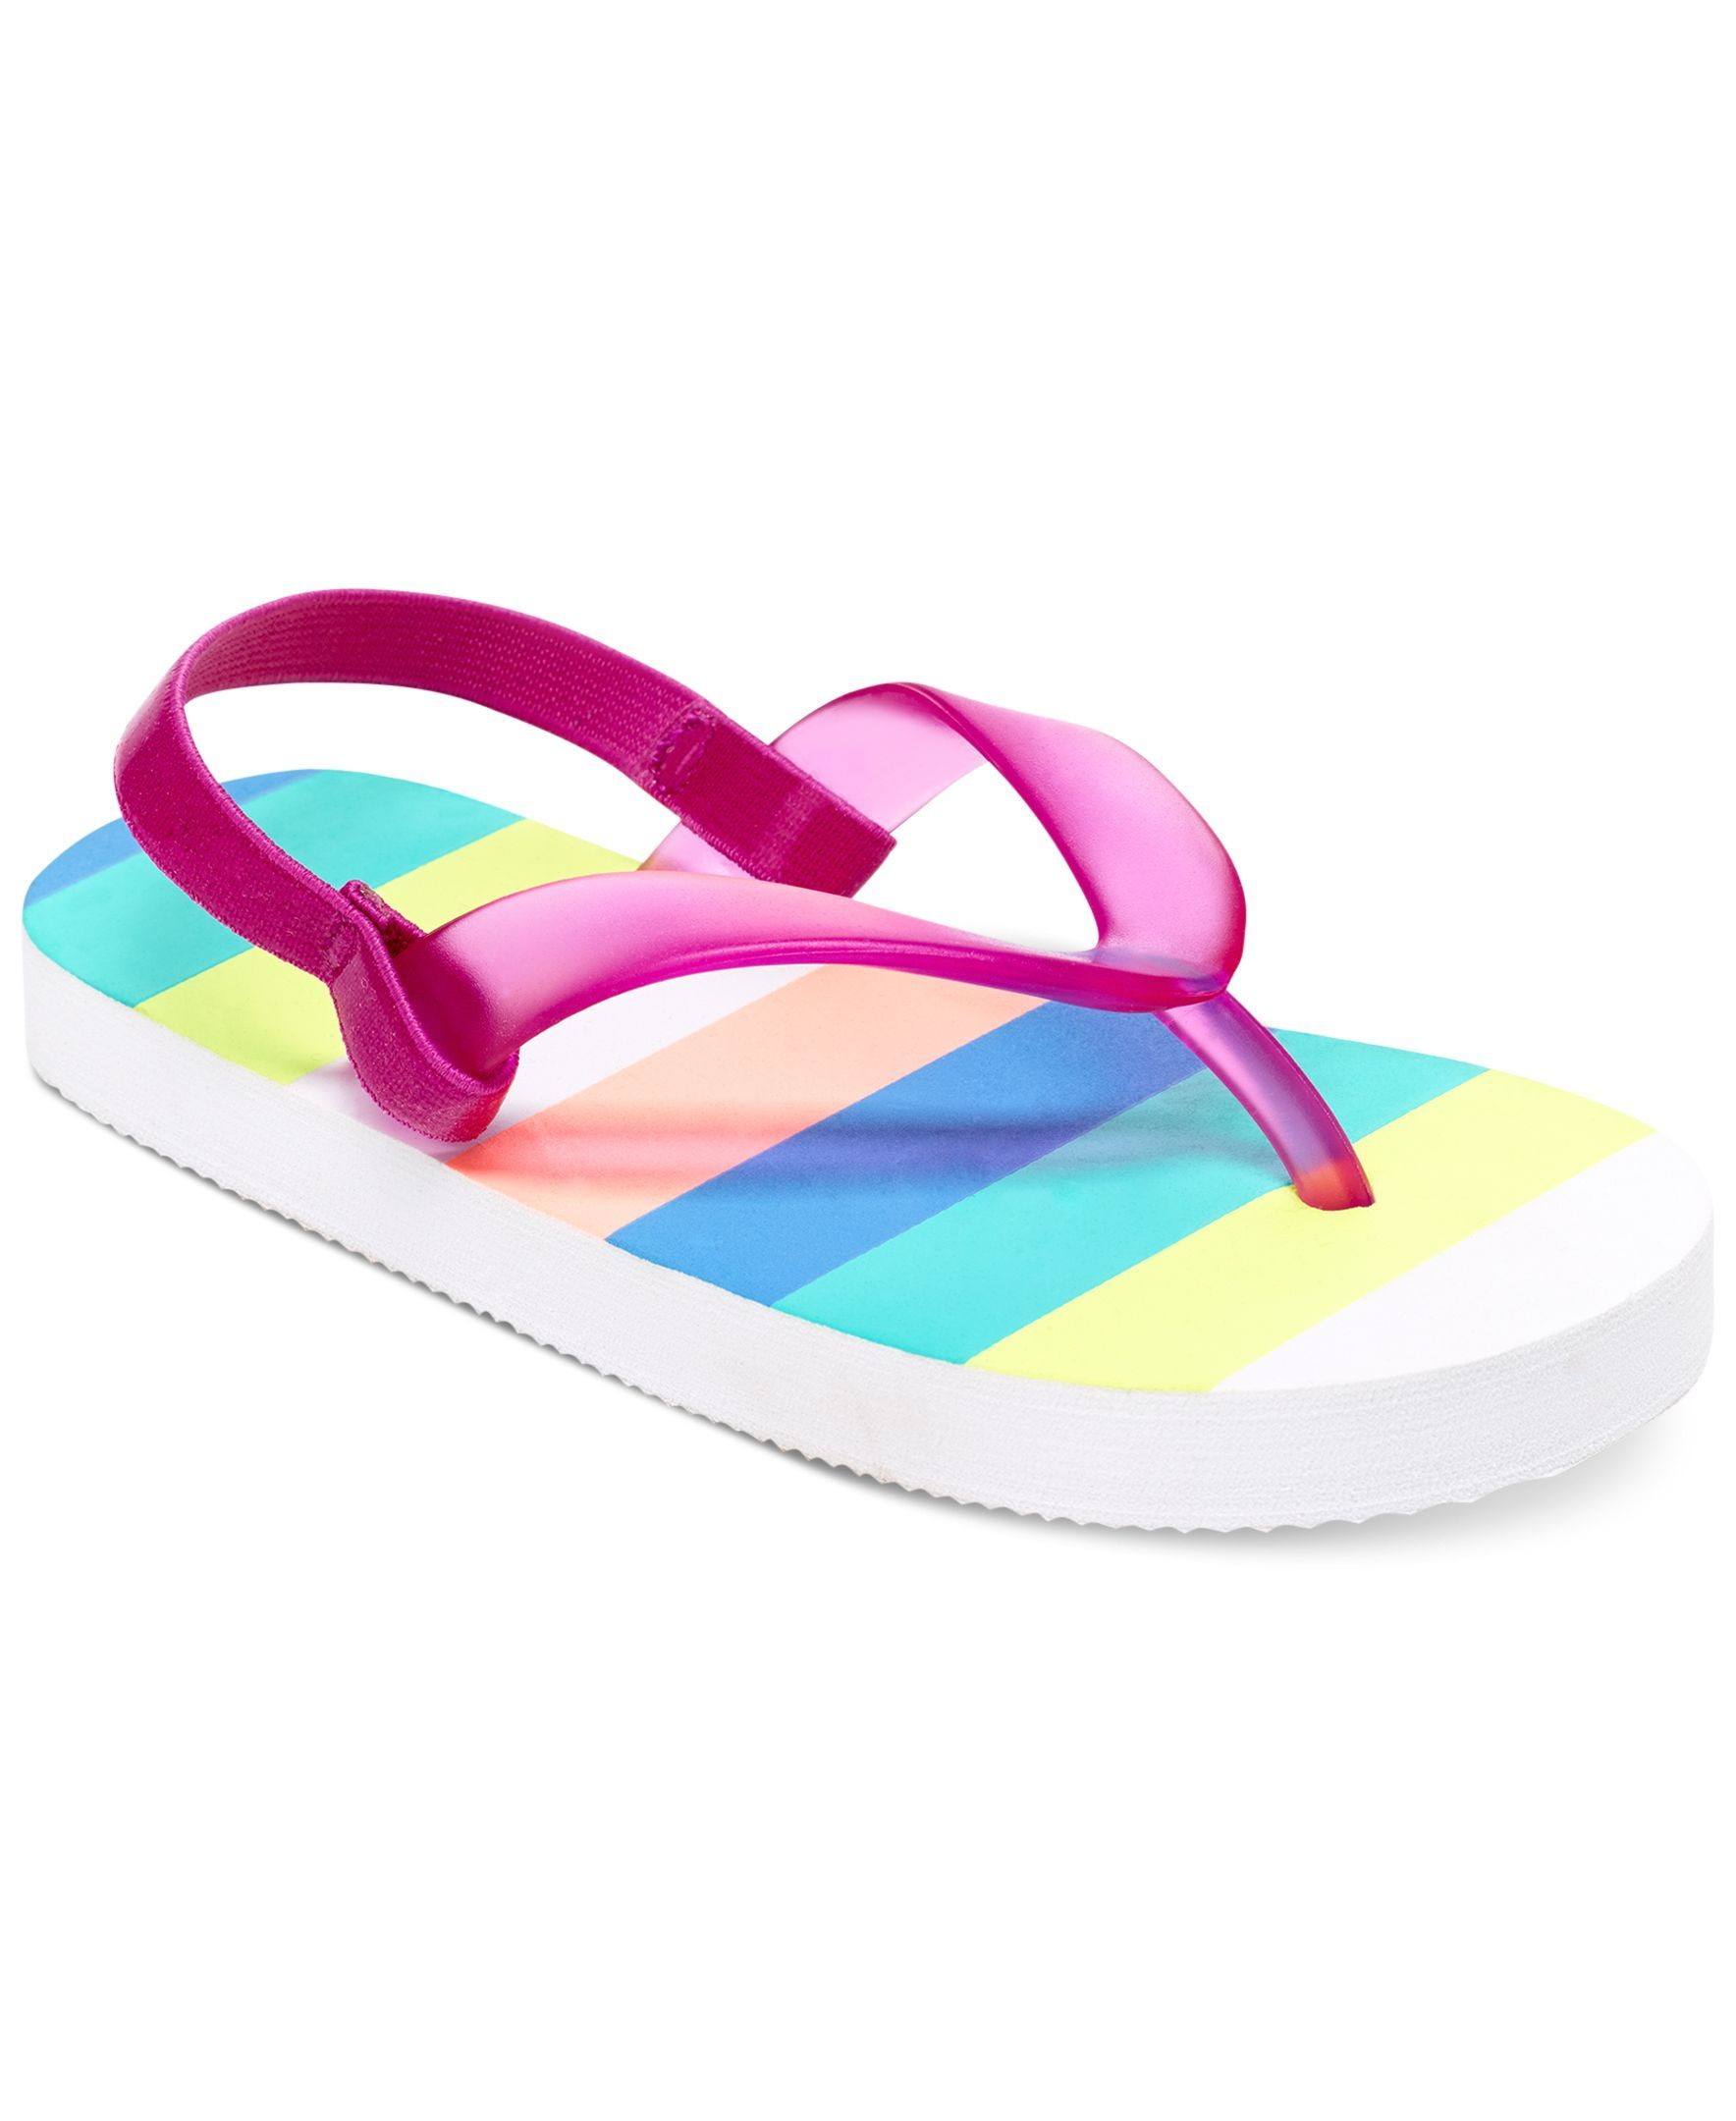 Girls flip flops, Toddler girl, Flop